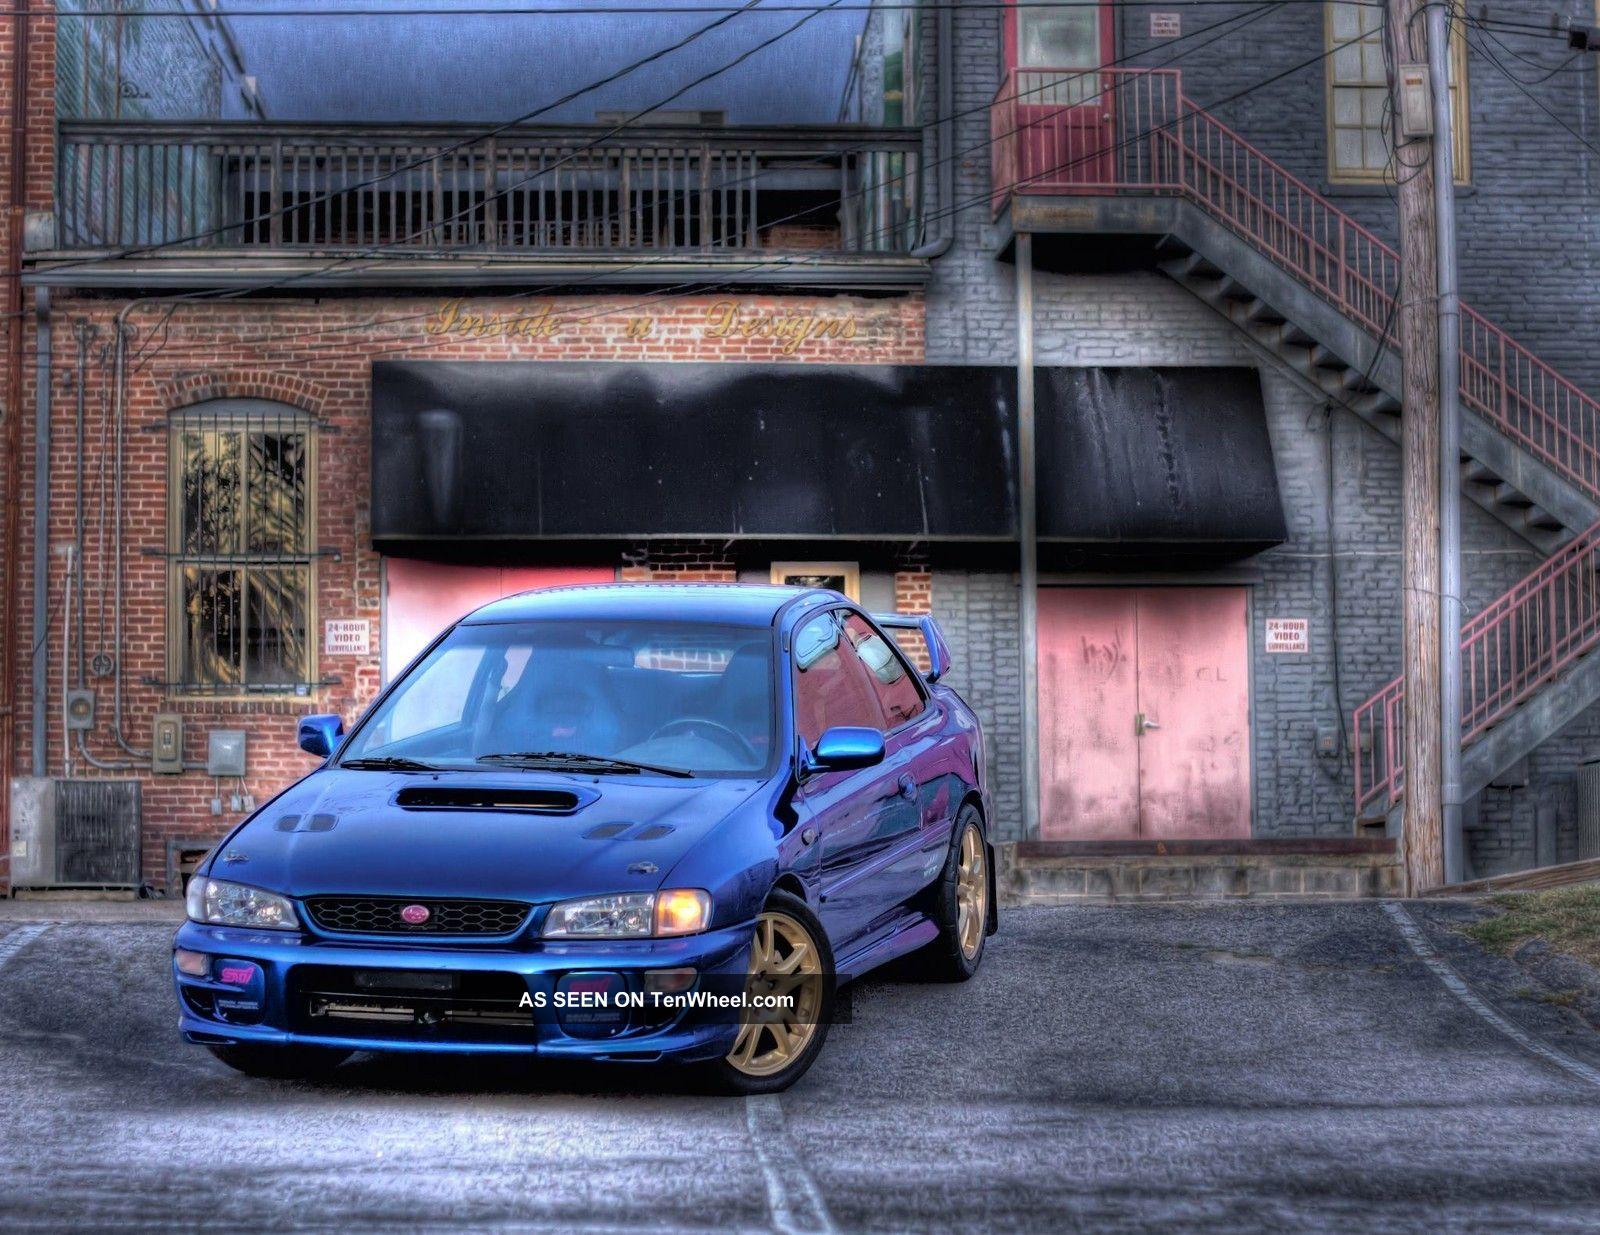 1997 Subaru Impreza Coupe Awd 2 5 Rs Jdm Wrx Sti World